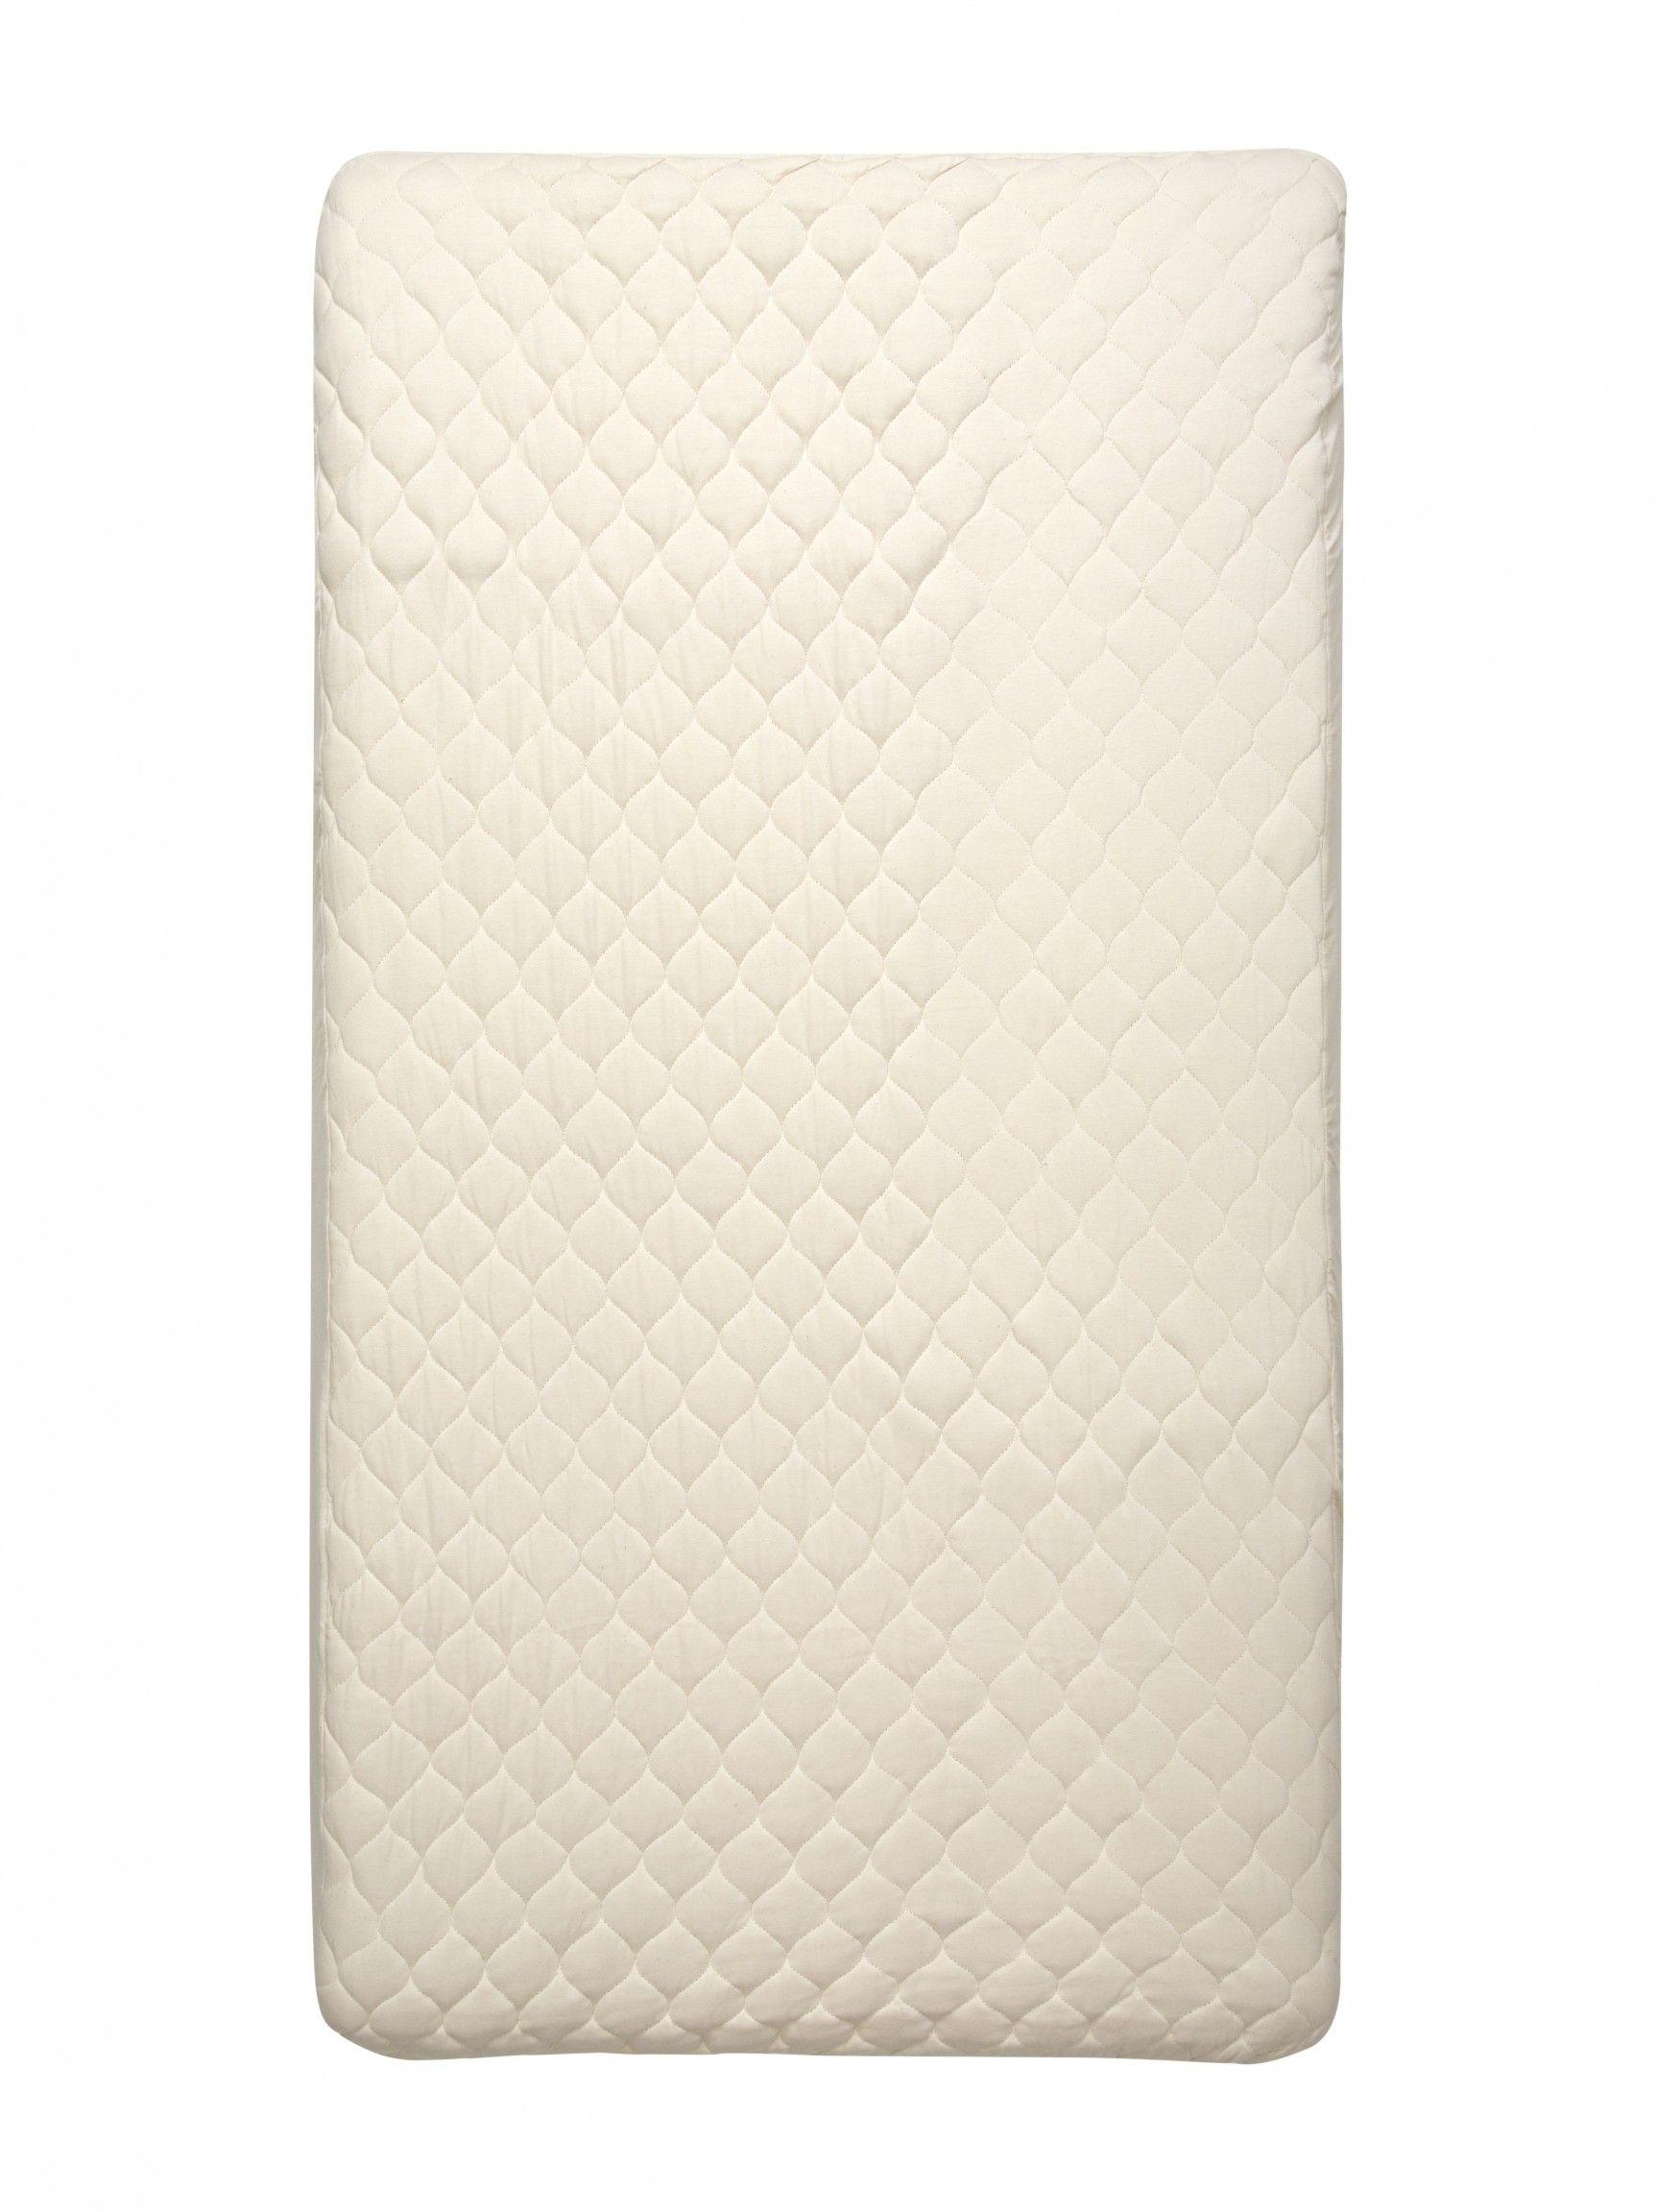 Organic Cotton Cradle Mattress Pad Mattress, Mattress